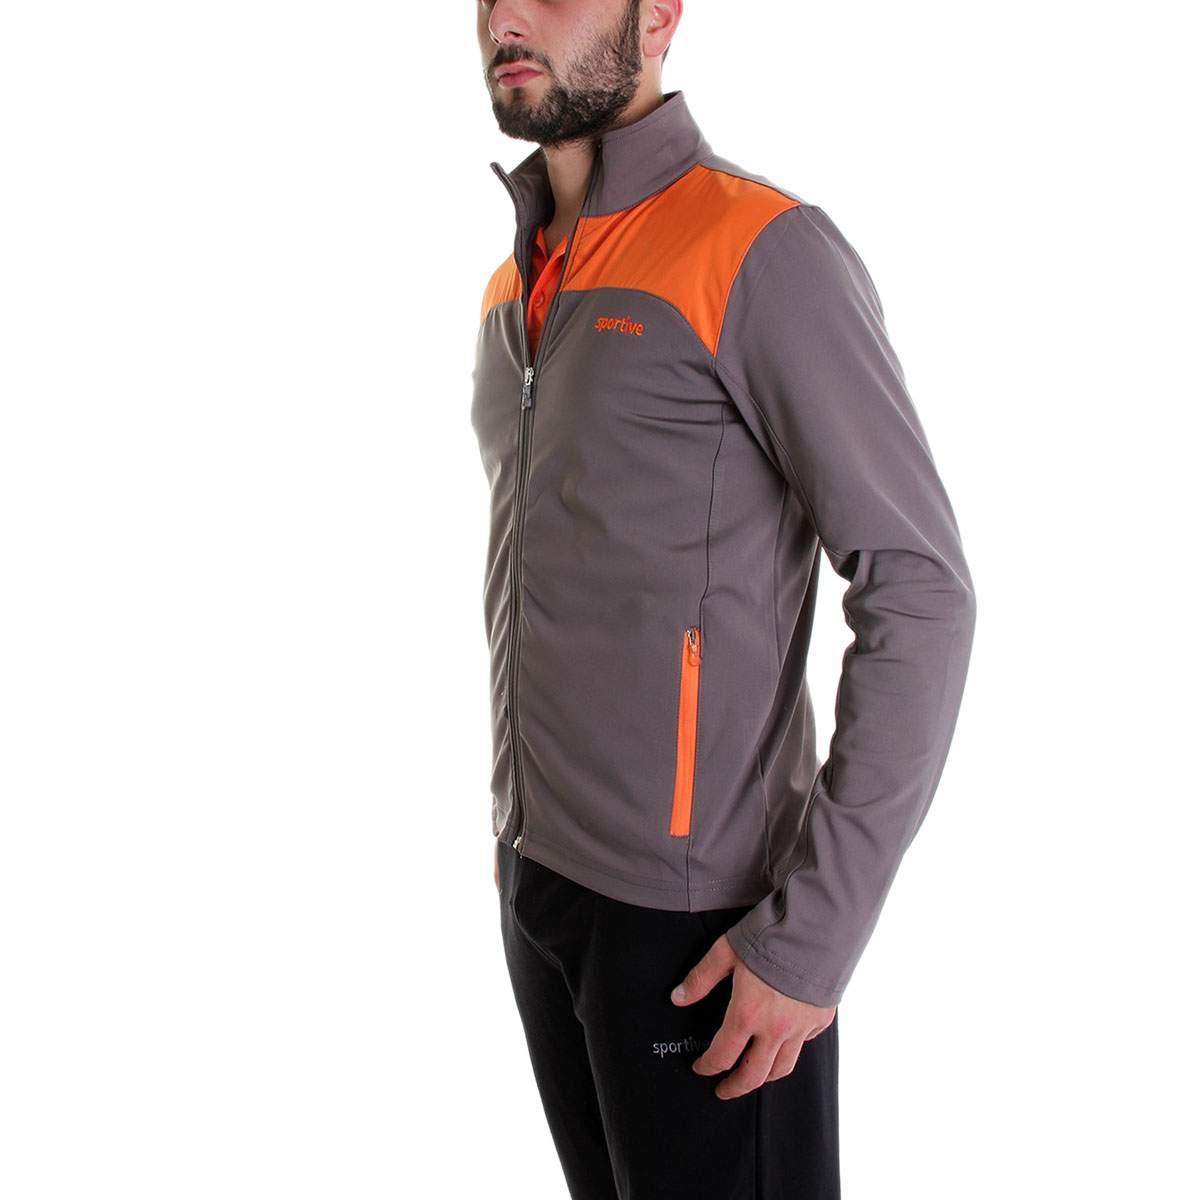 Sportive Mikpoltop Erkek Fermuarlı Gri-Turuncu Sweatshirt